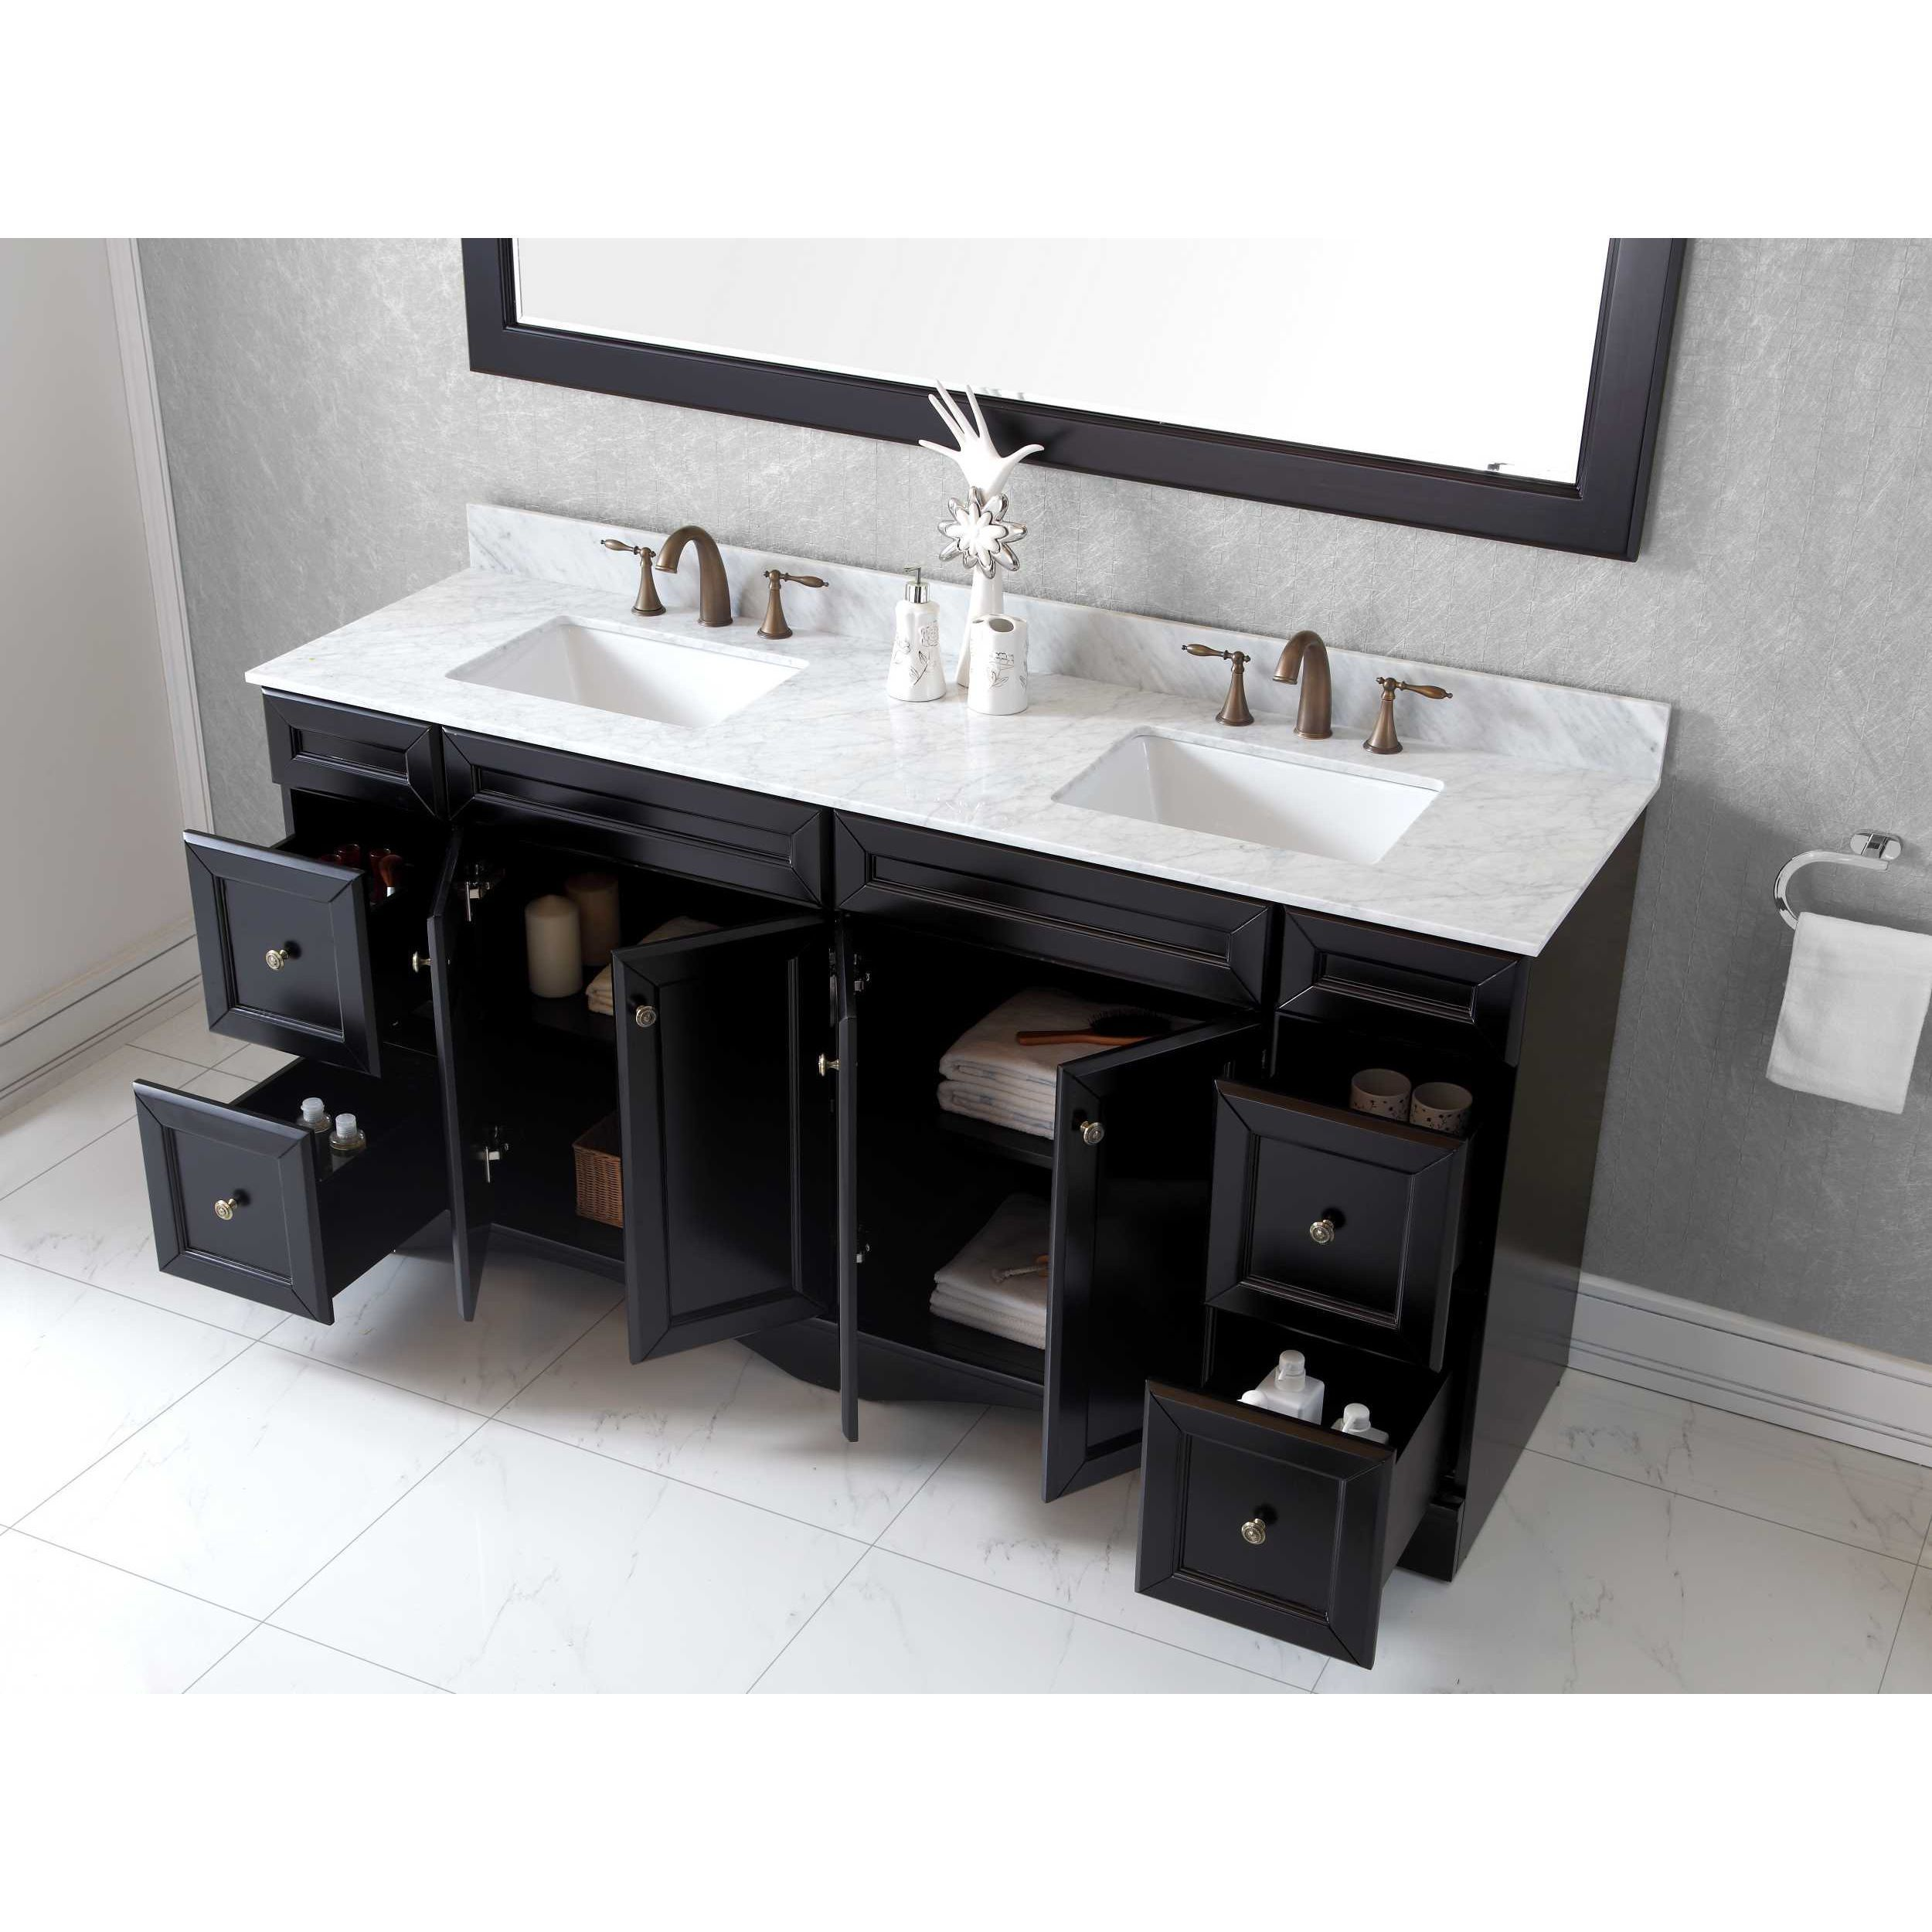 Shop Virtu USA Talisa 72-inch Square Carrara White Marble Double ...